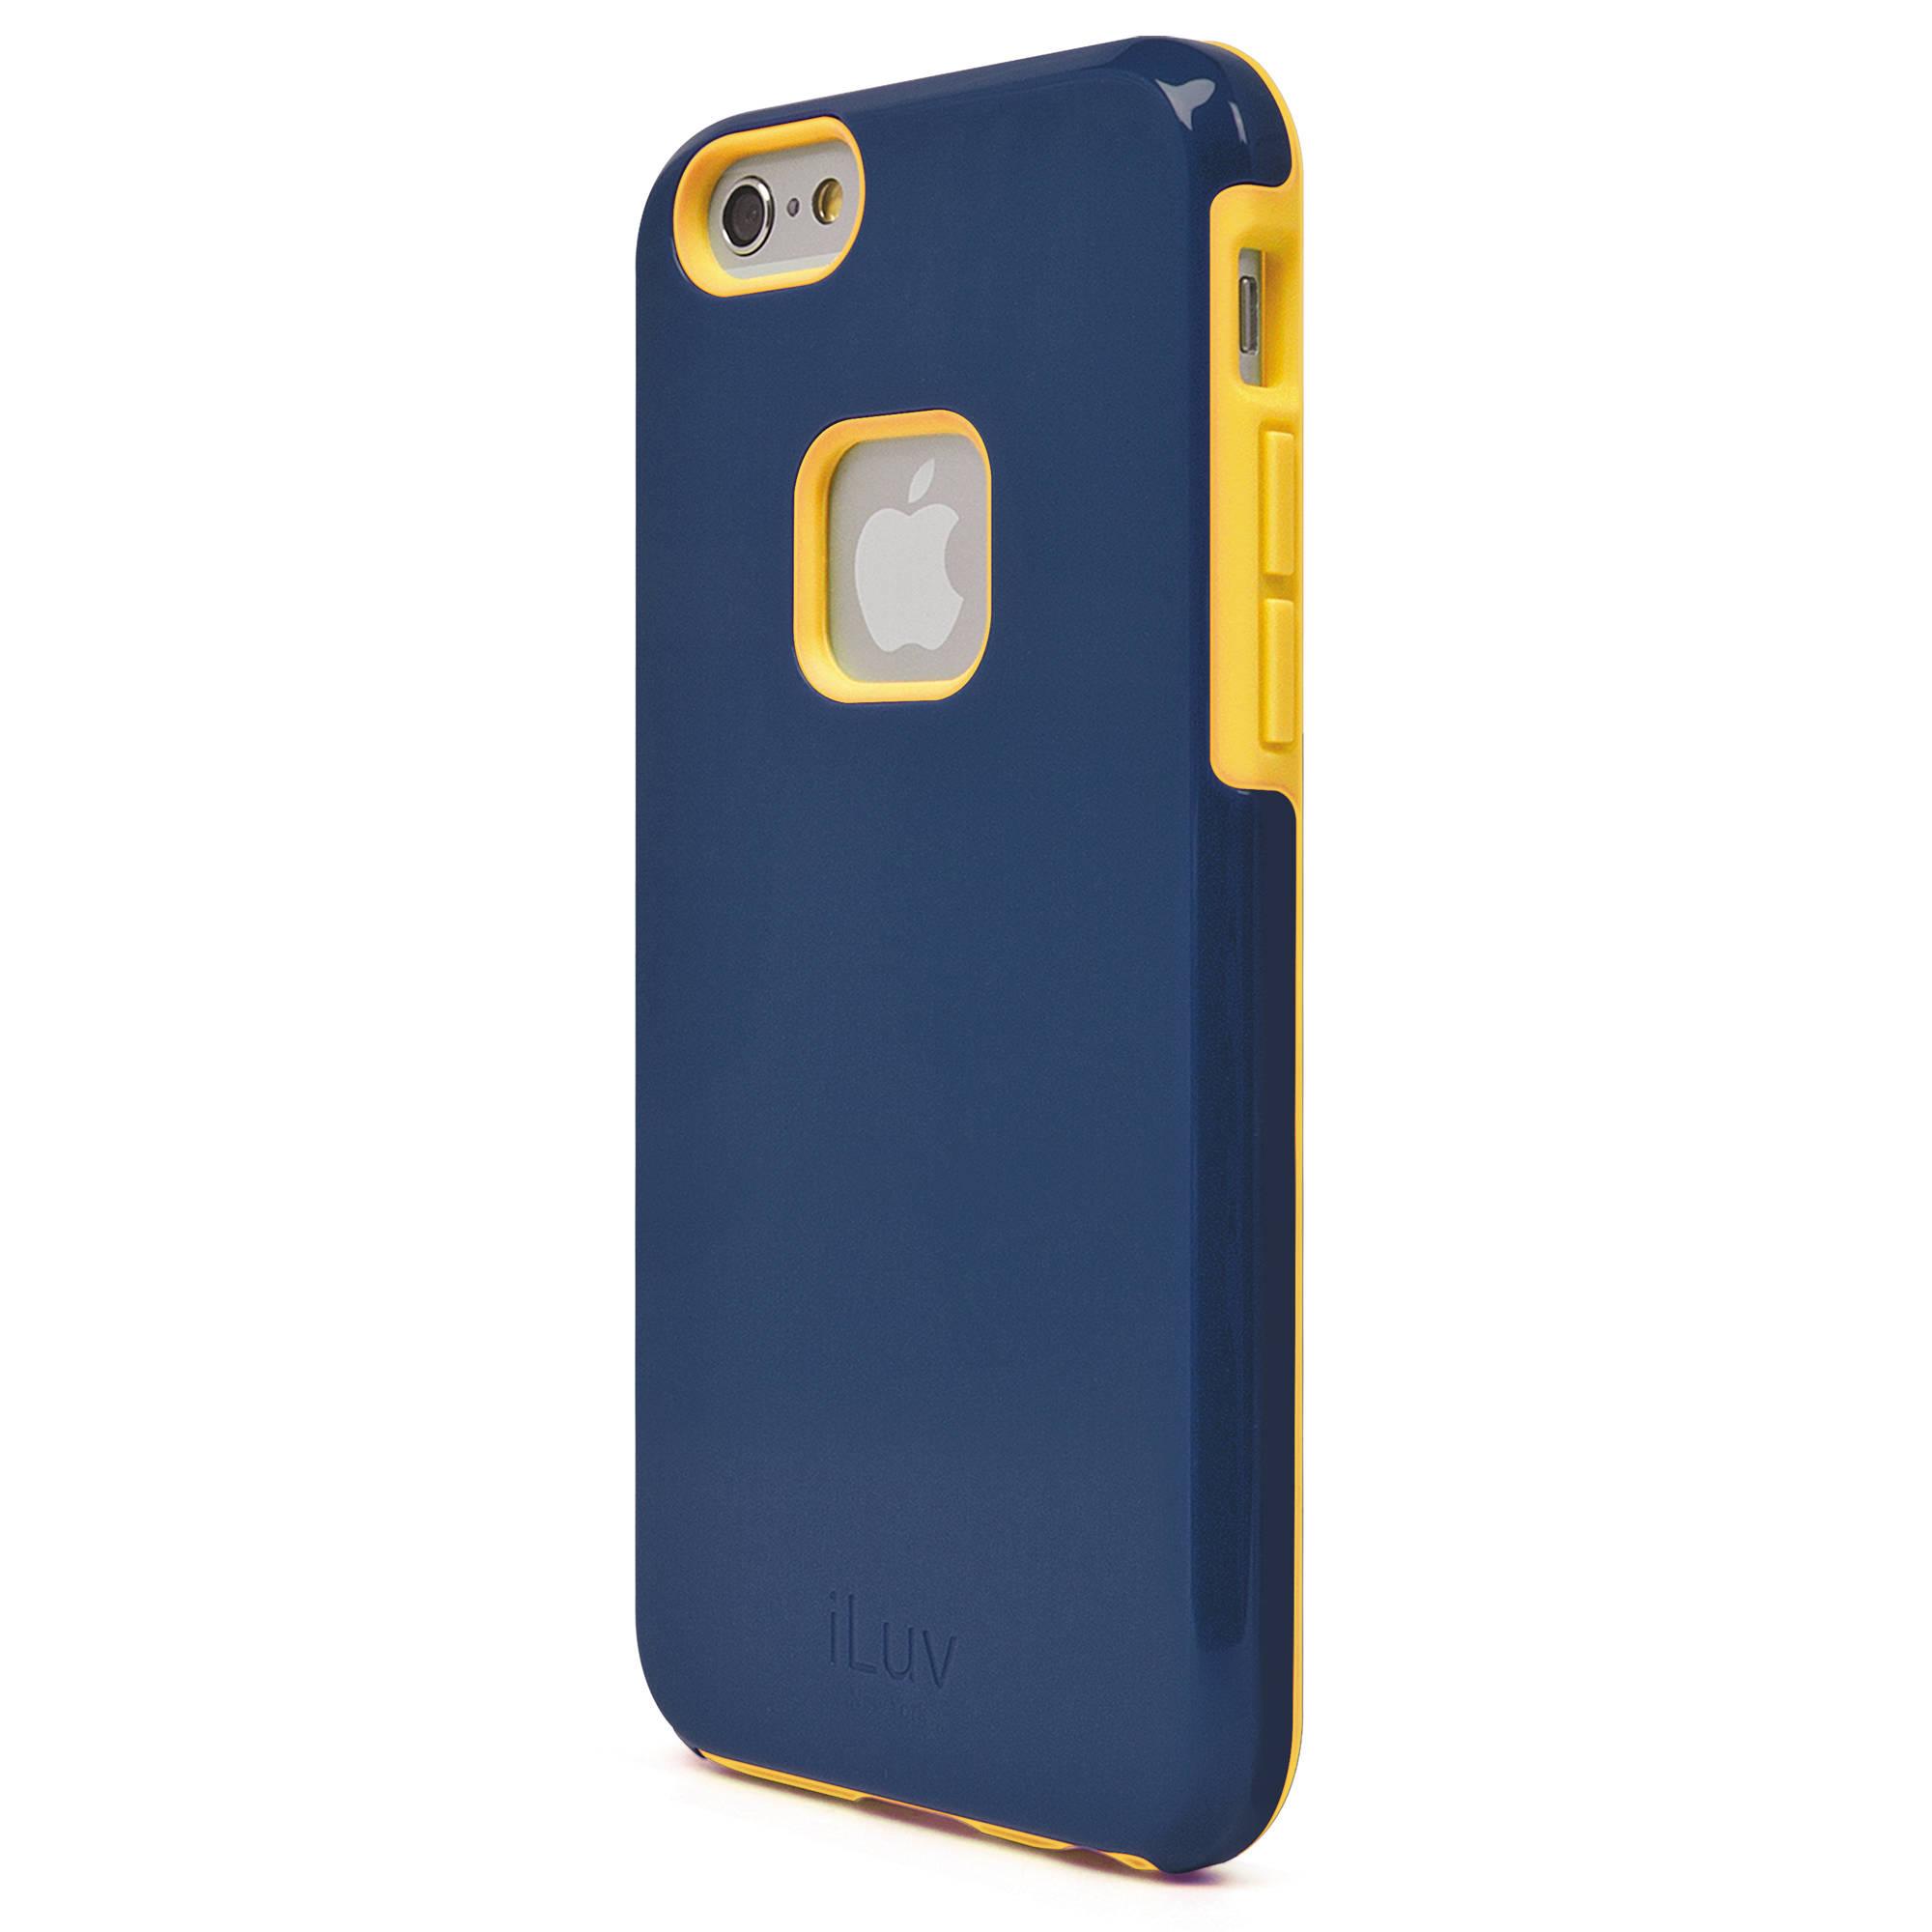 iluv regatta case for iphone 6 6s blue ai6regabl b h photo. Black Bedroom Furniture Sets. Home Design Ideas